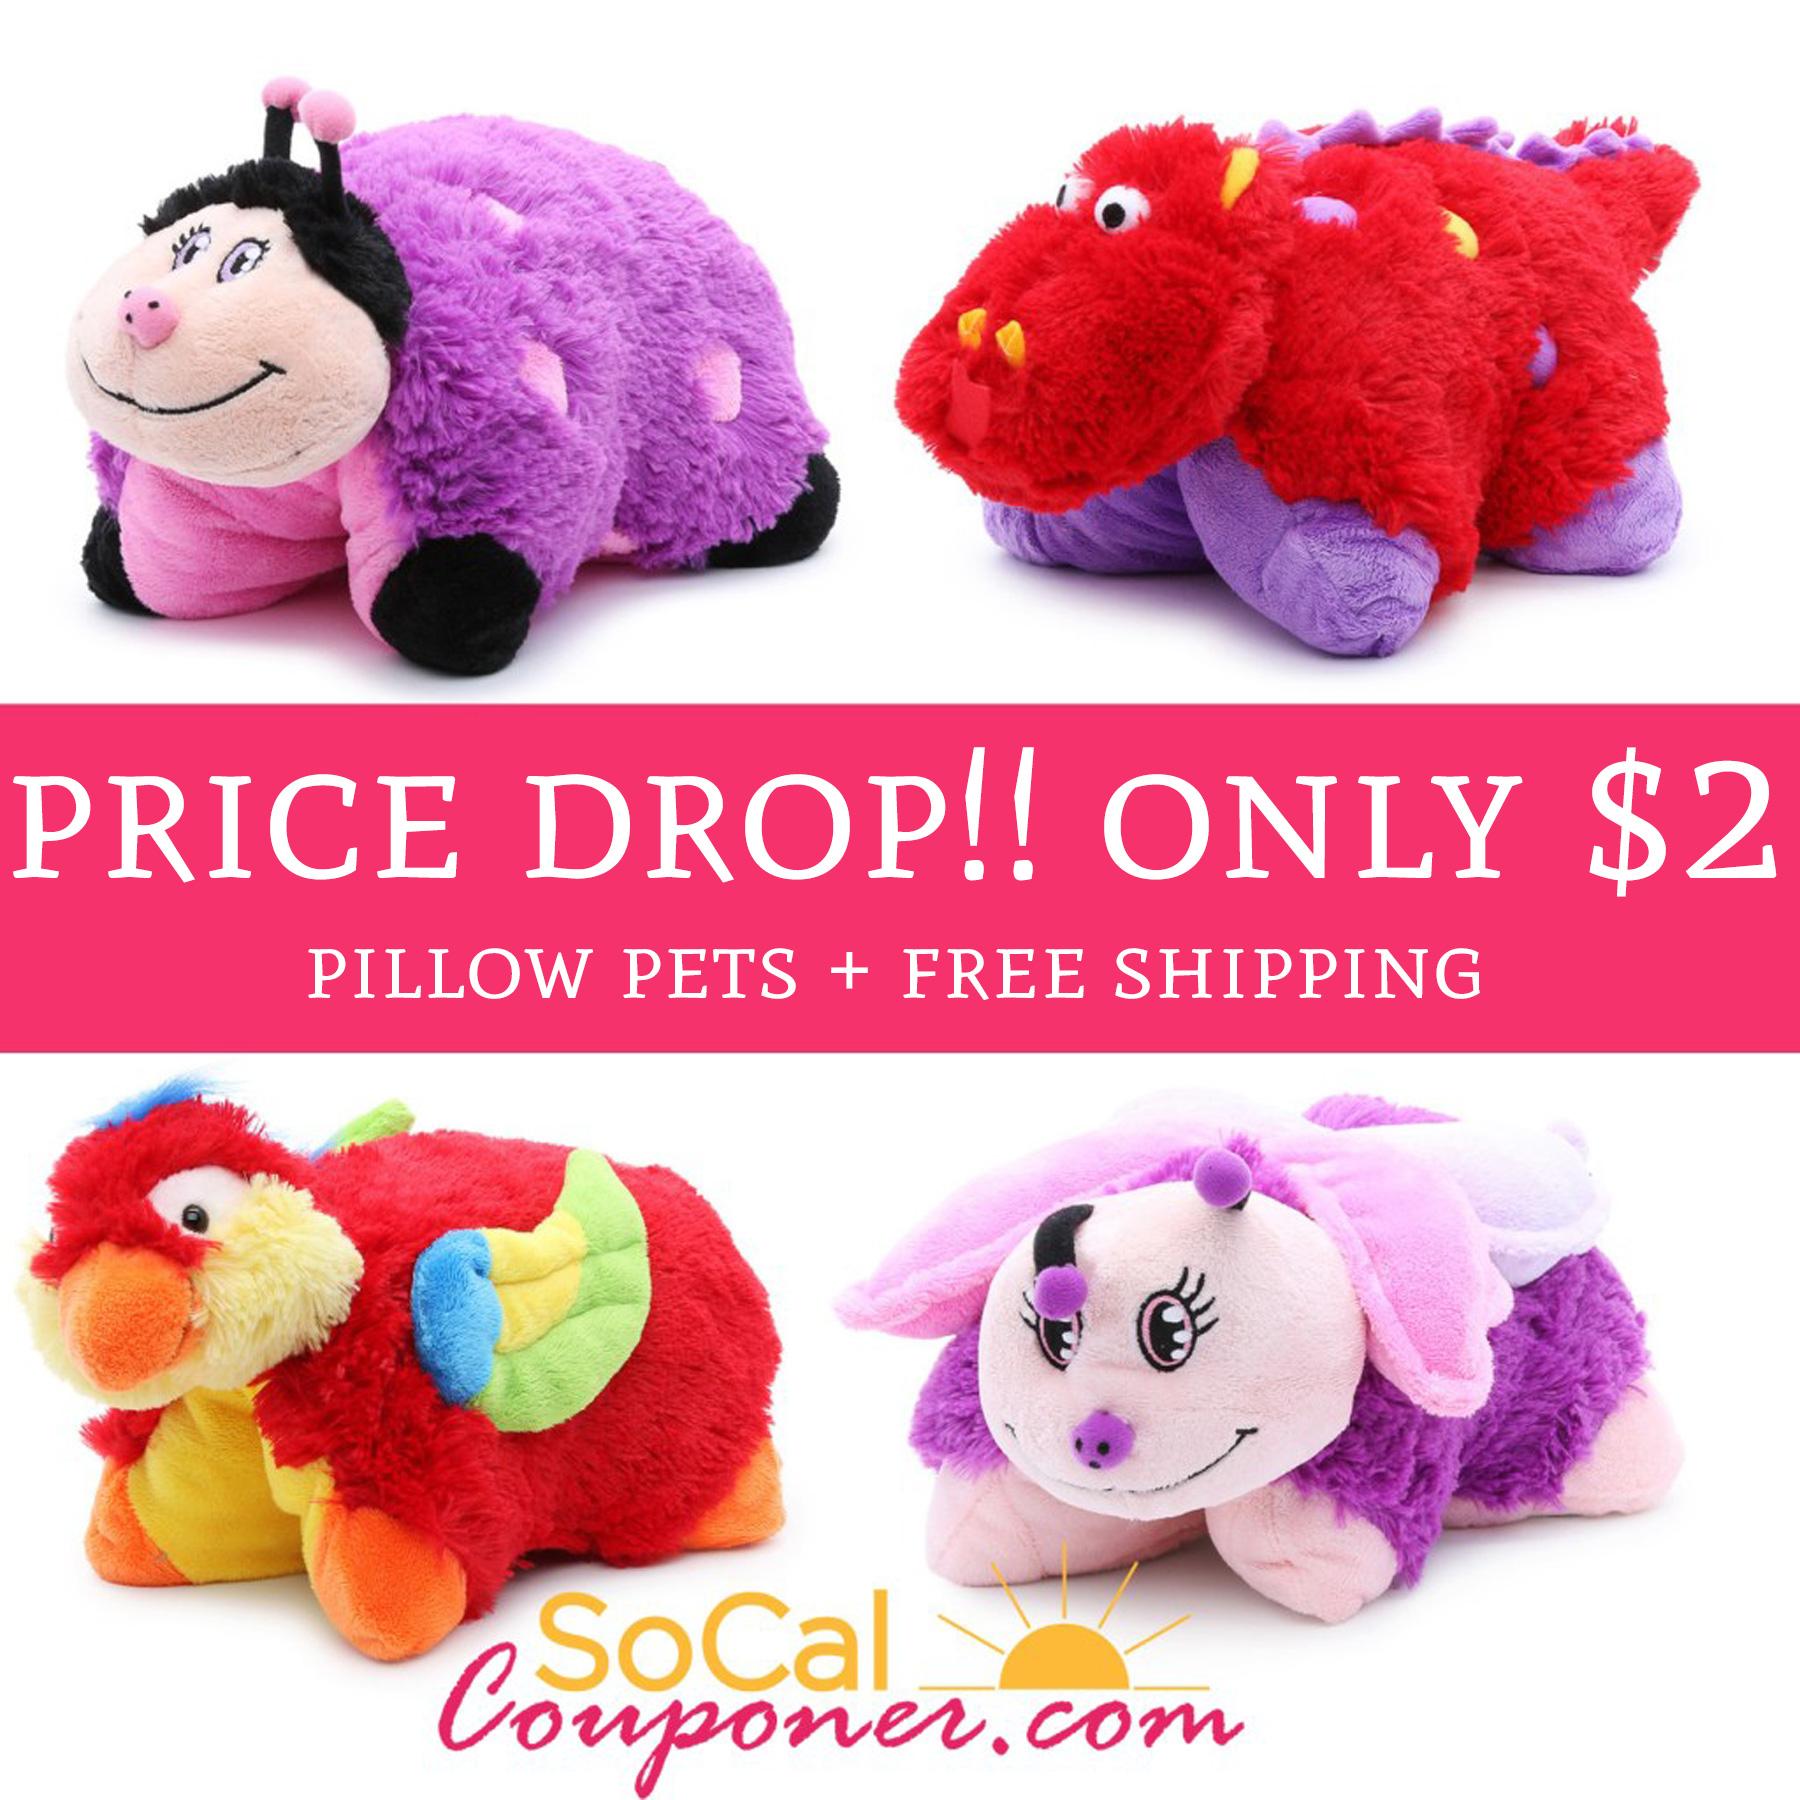 Price Drop Only 2 Regular 9 Pillow Pets Free